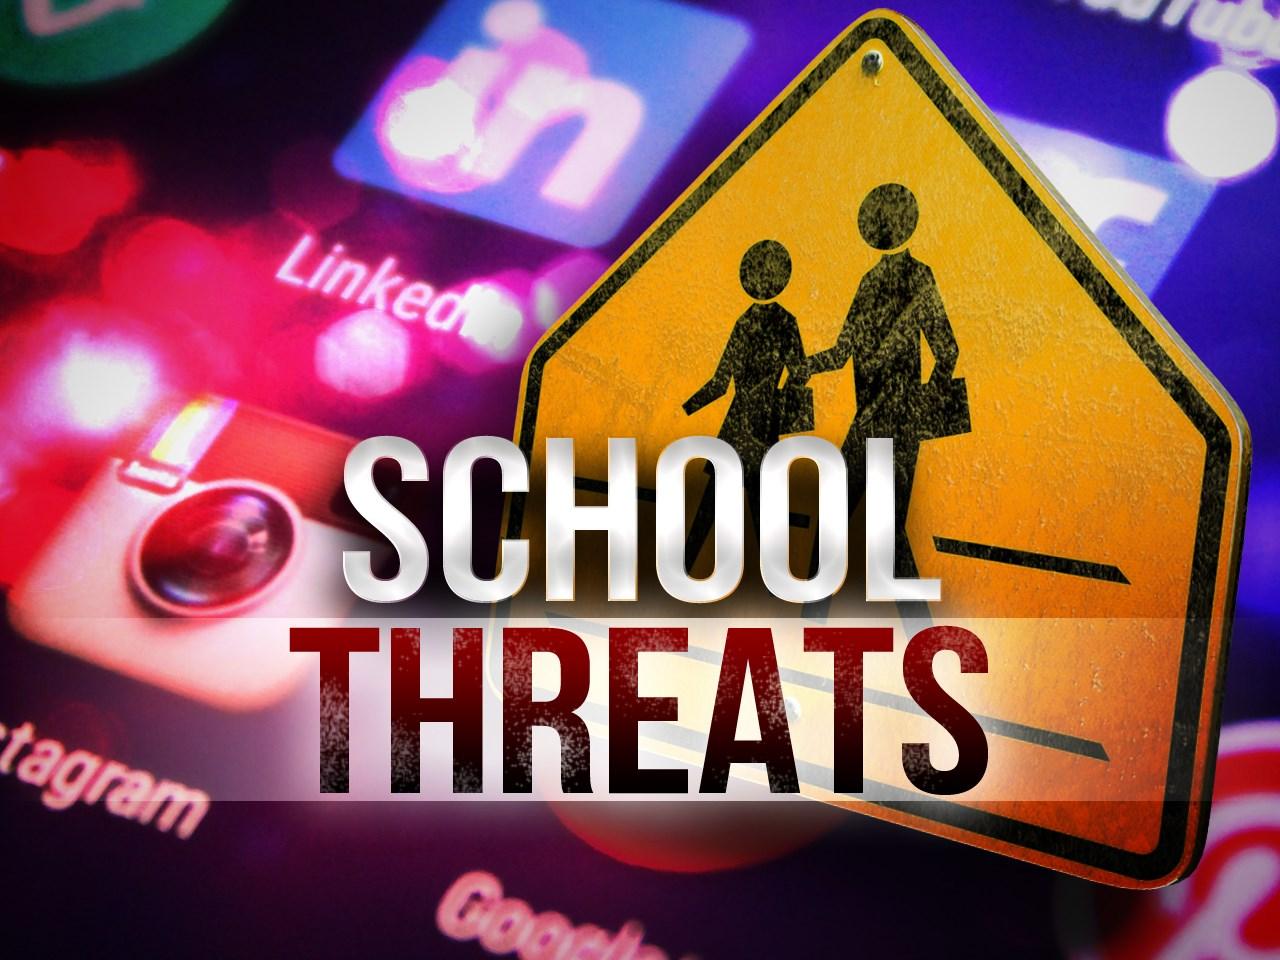 School threat